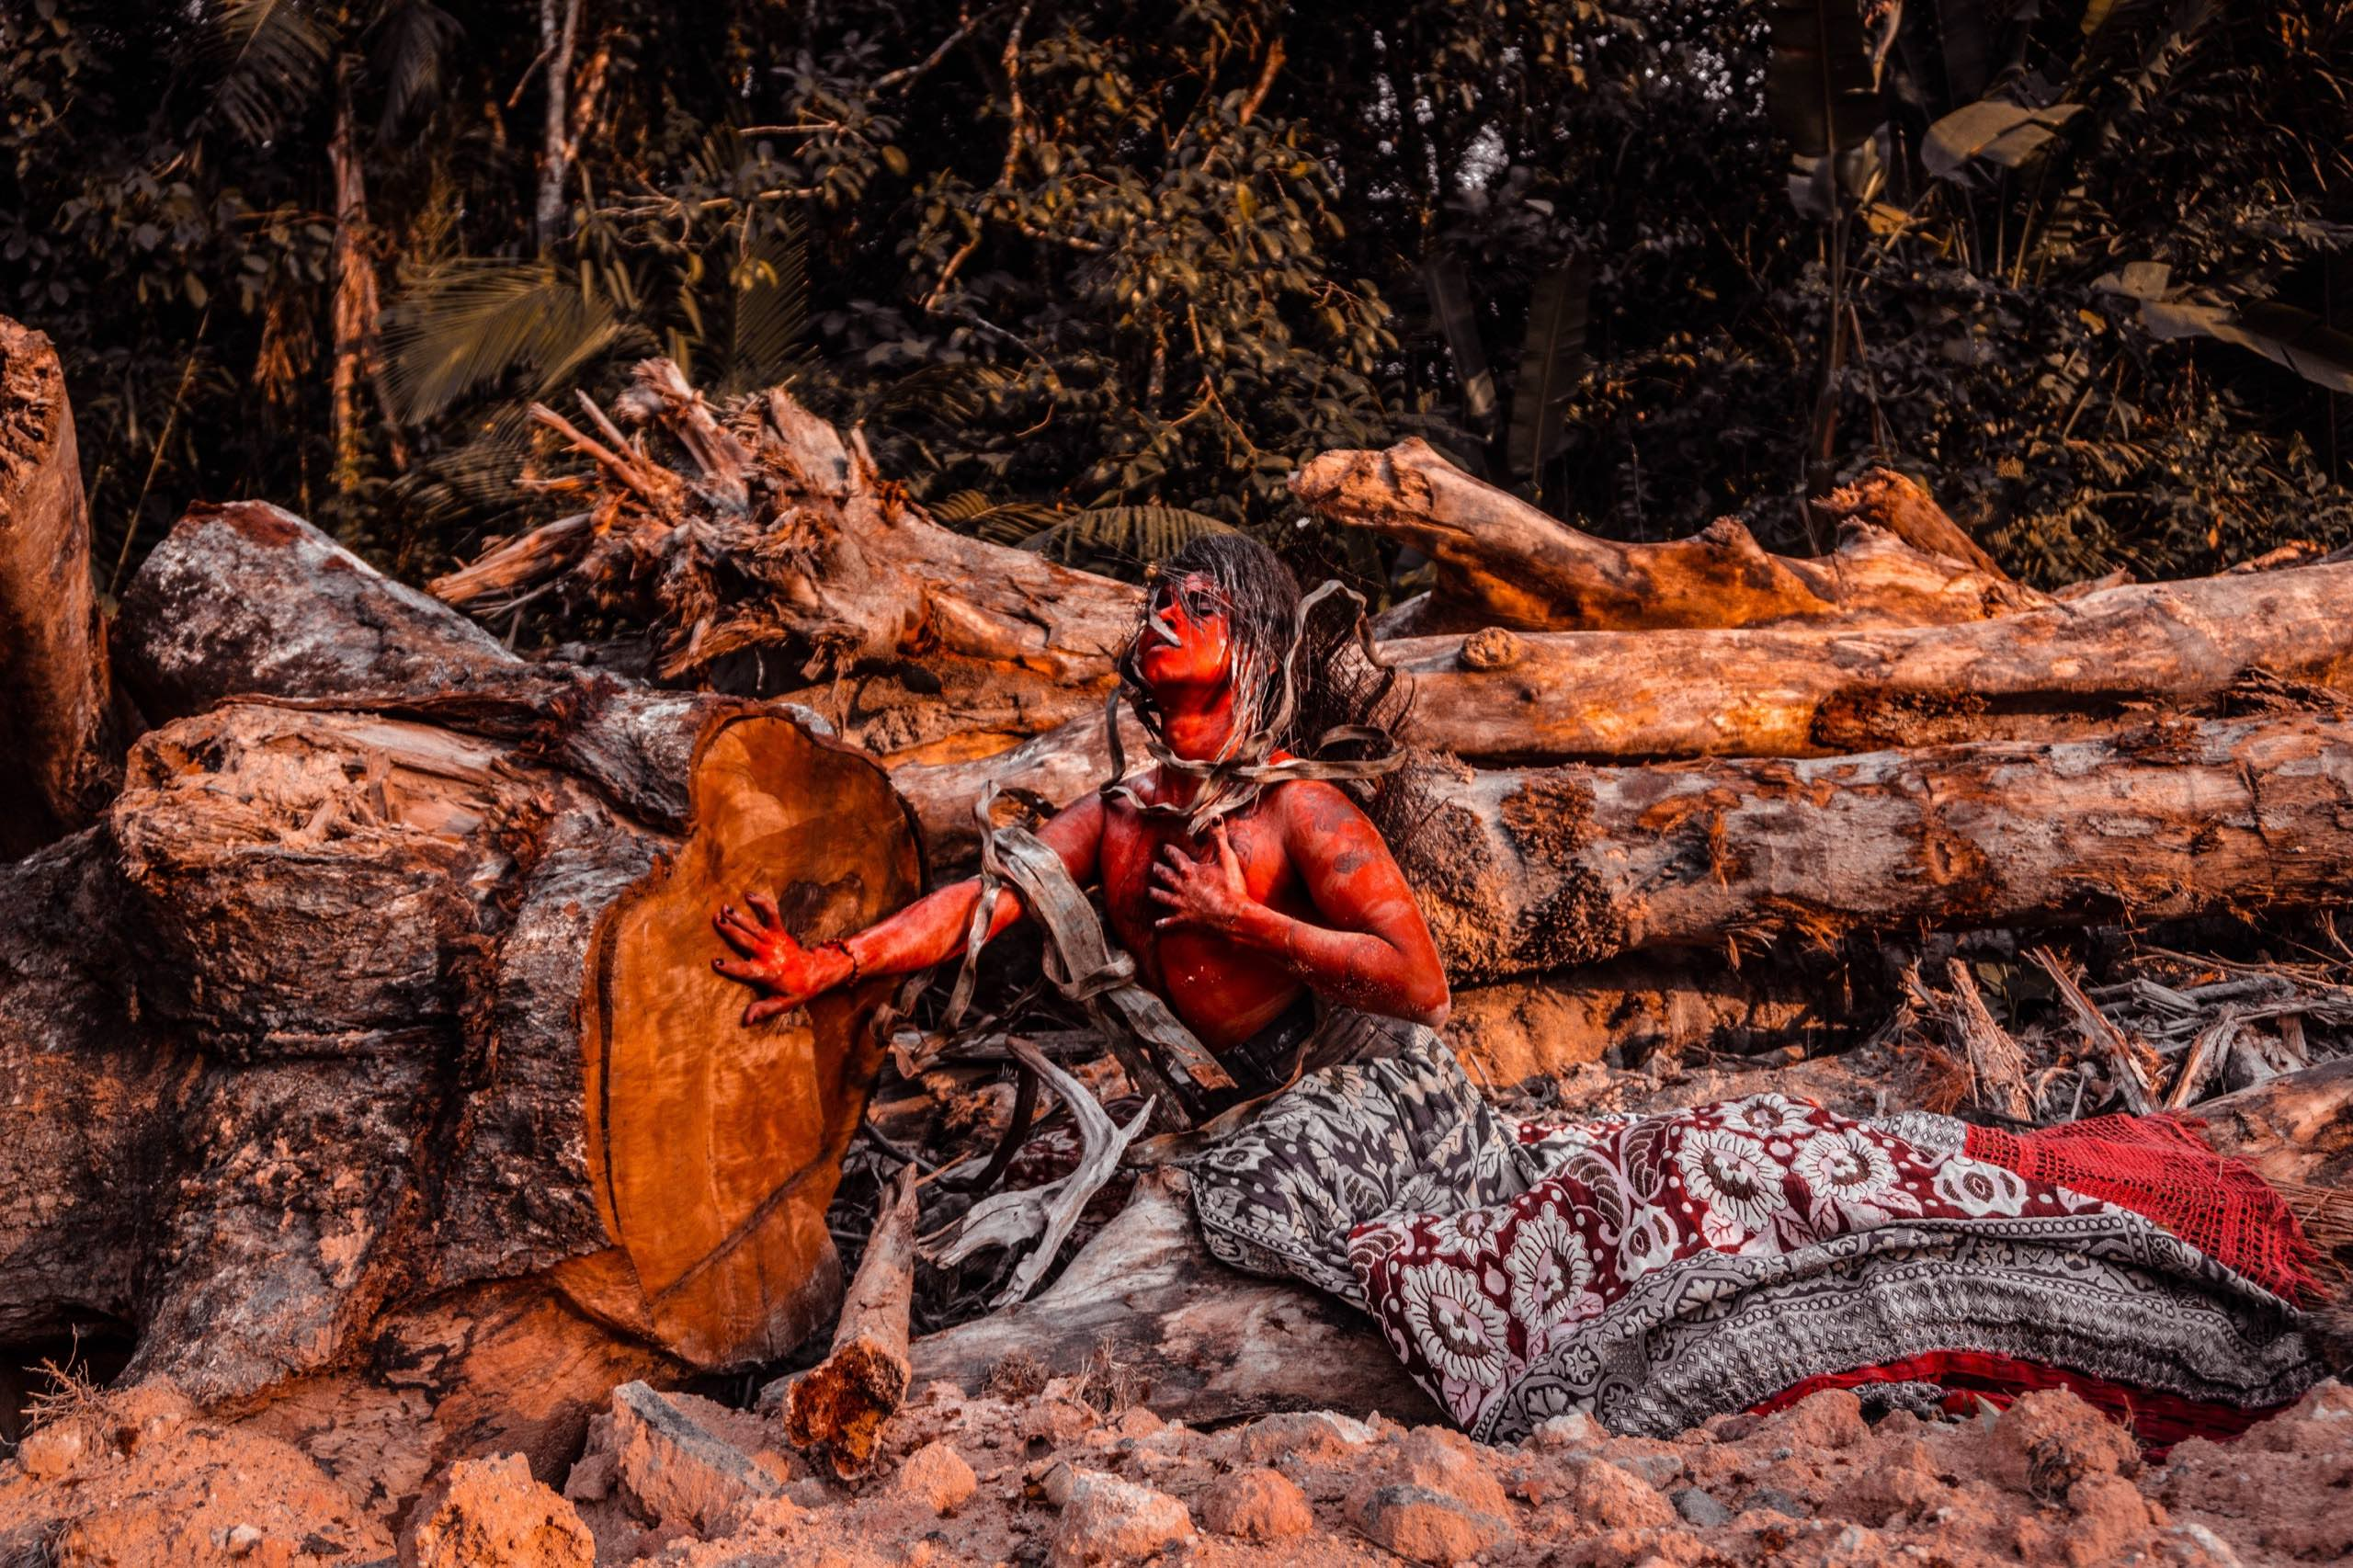 Emerson Uýra, Série A Última Floresta (Ensaio Terra Pelada) / The Last Forest Series (Naked Earth Essay), 2018, Digital print on metal, Photo by Matheus Belém